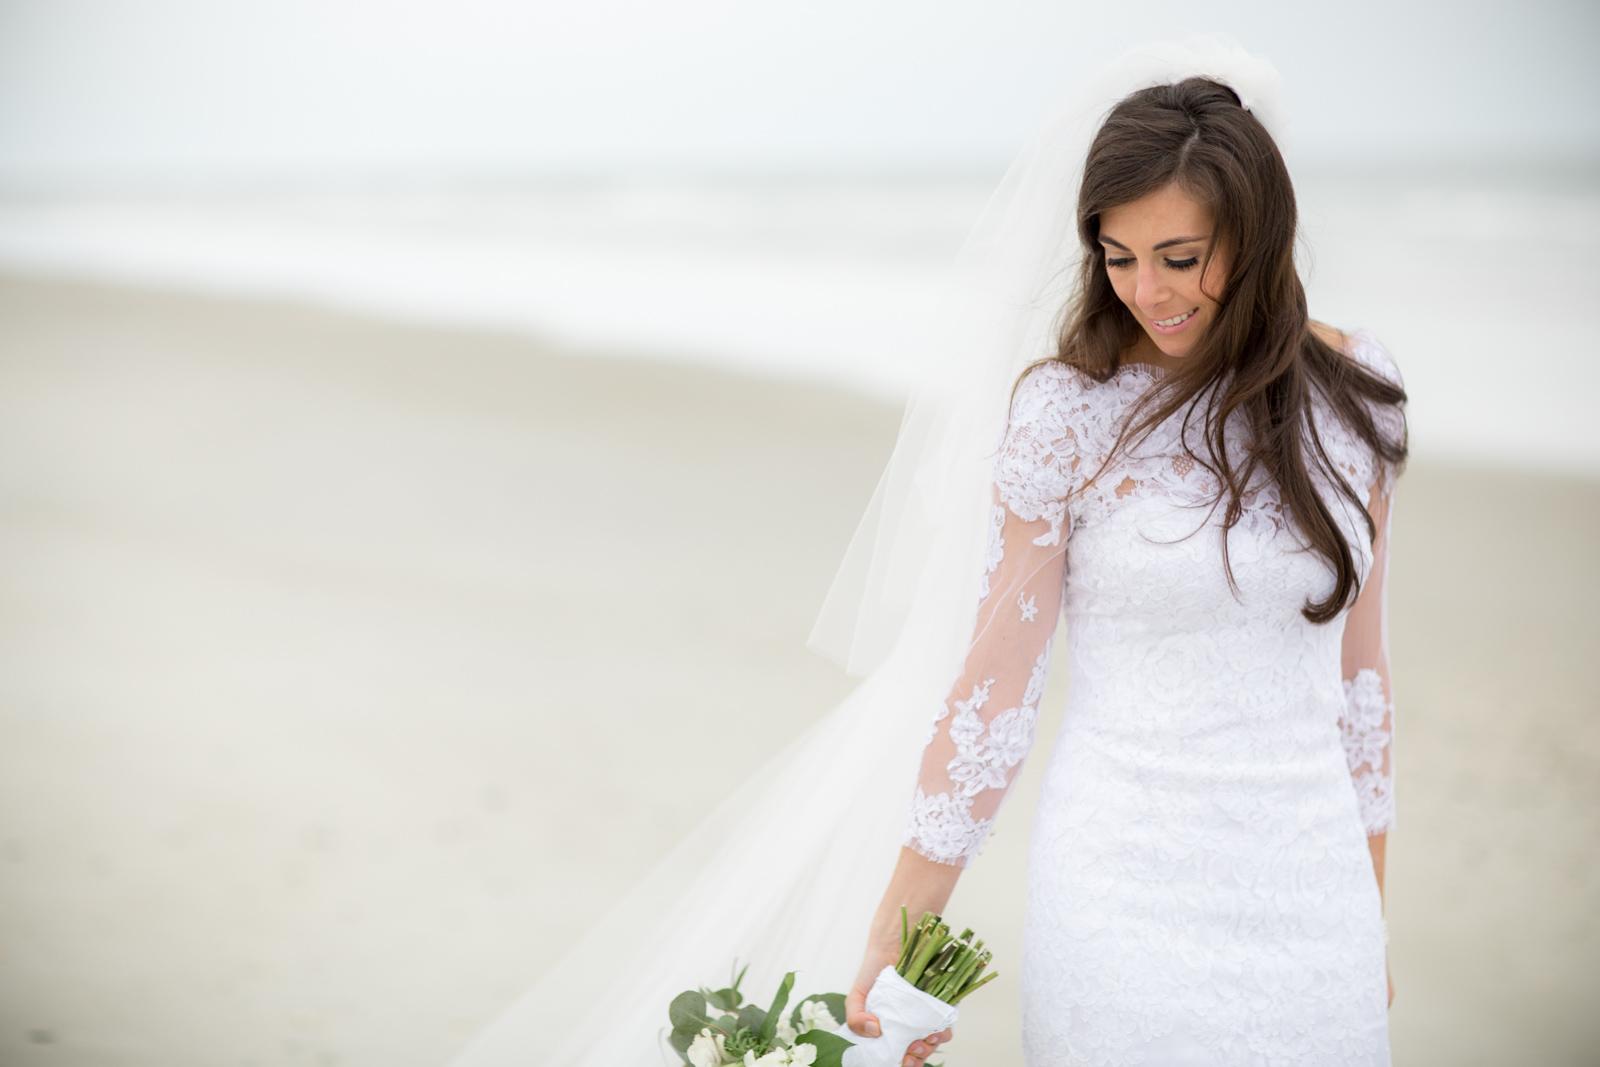 Figure eight island wedding-29.jpg